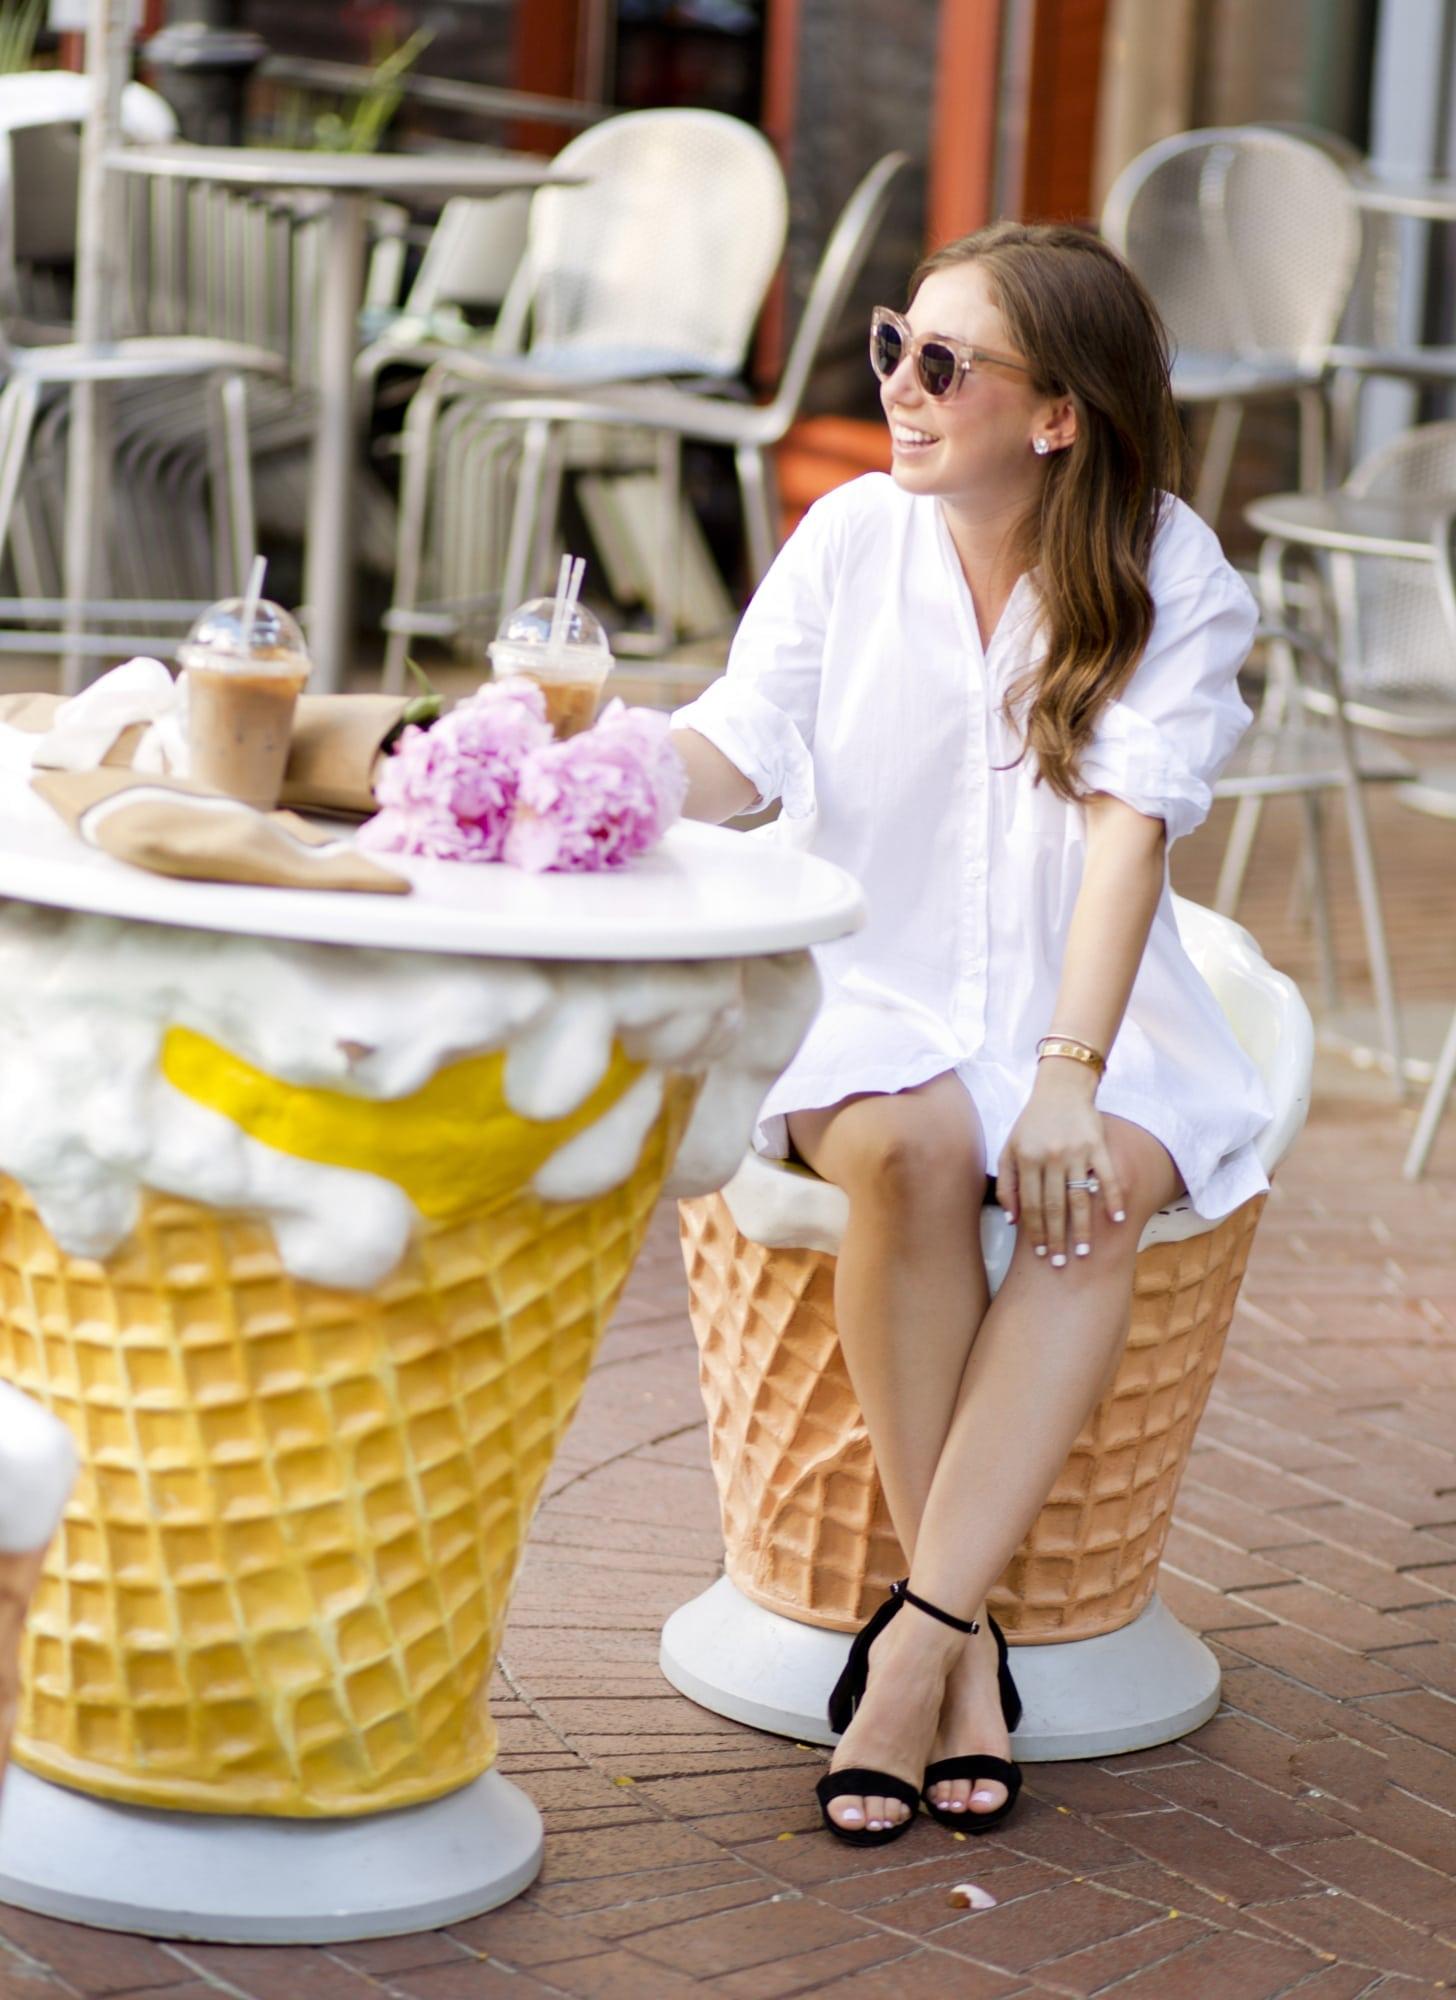 White Shirt Dress at Ice Cream Shop